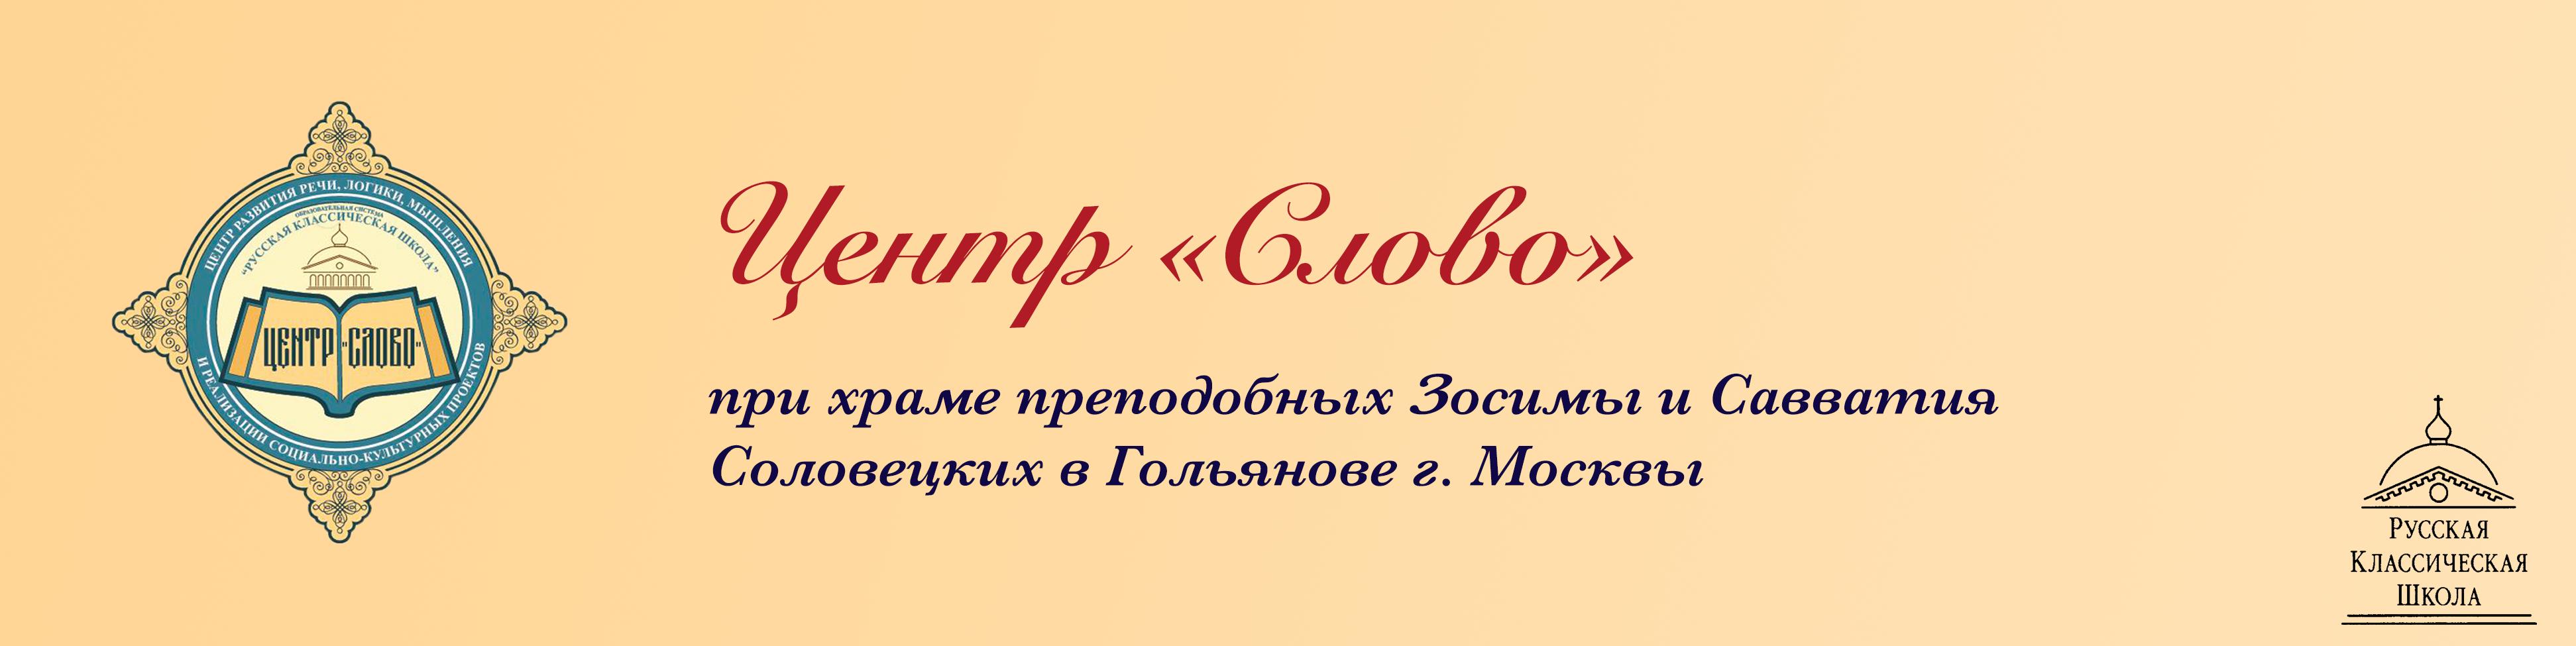 "Центр ""Слово"""